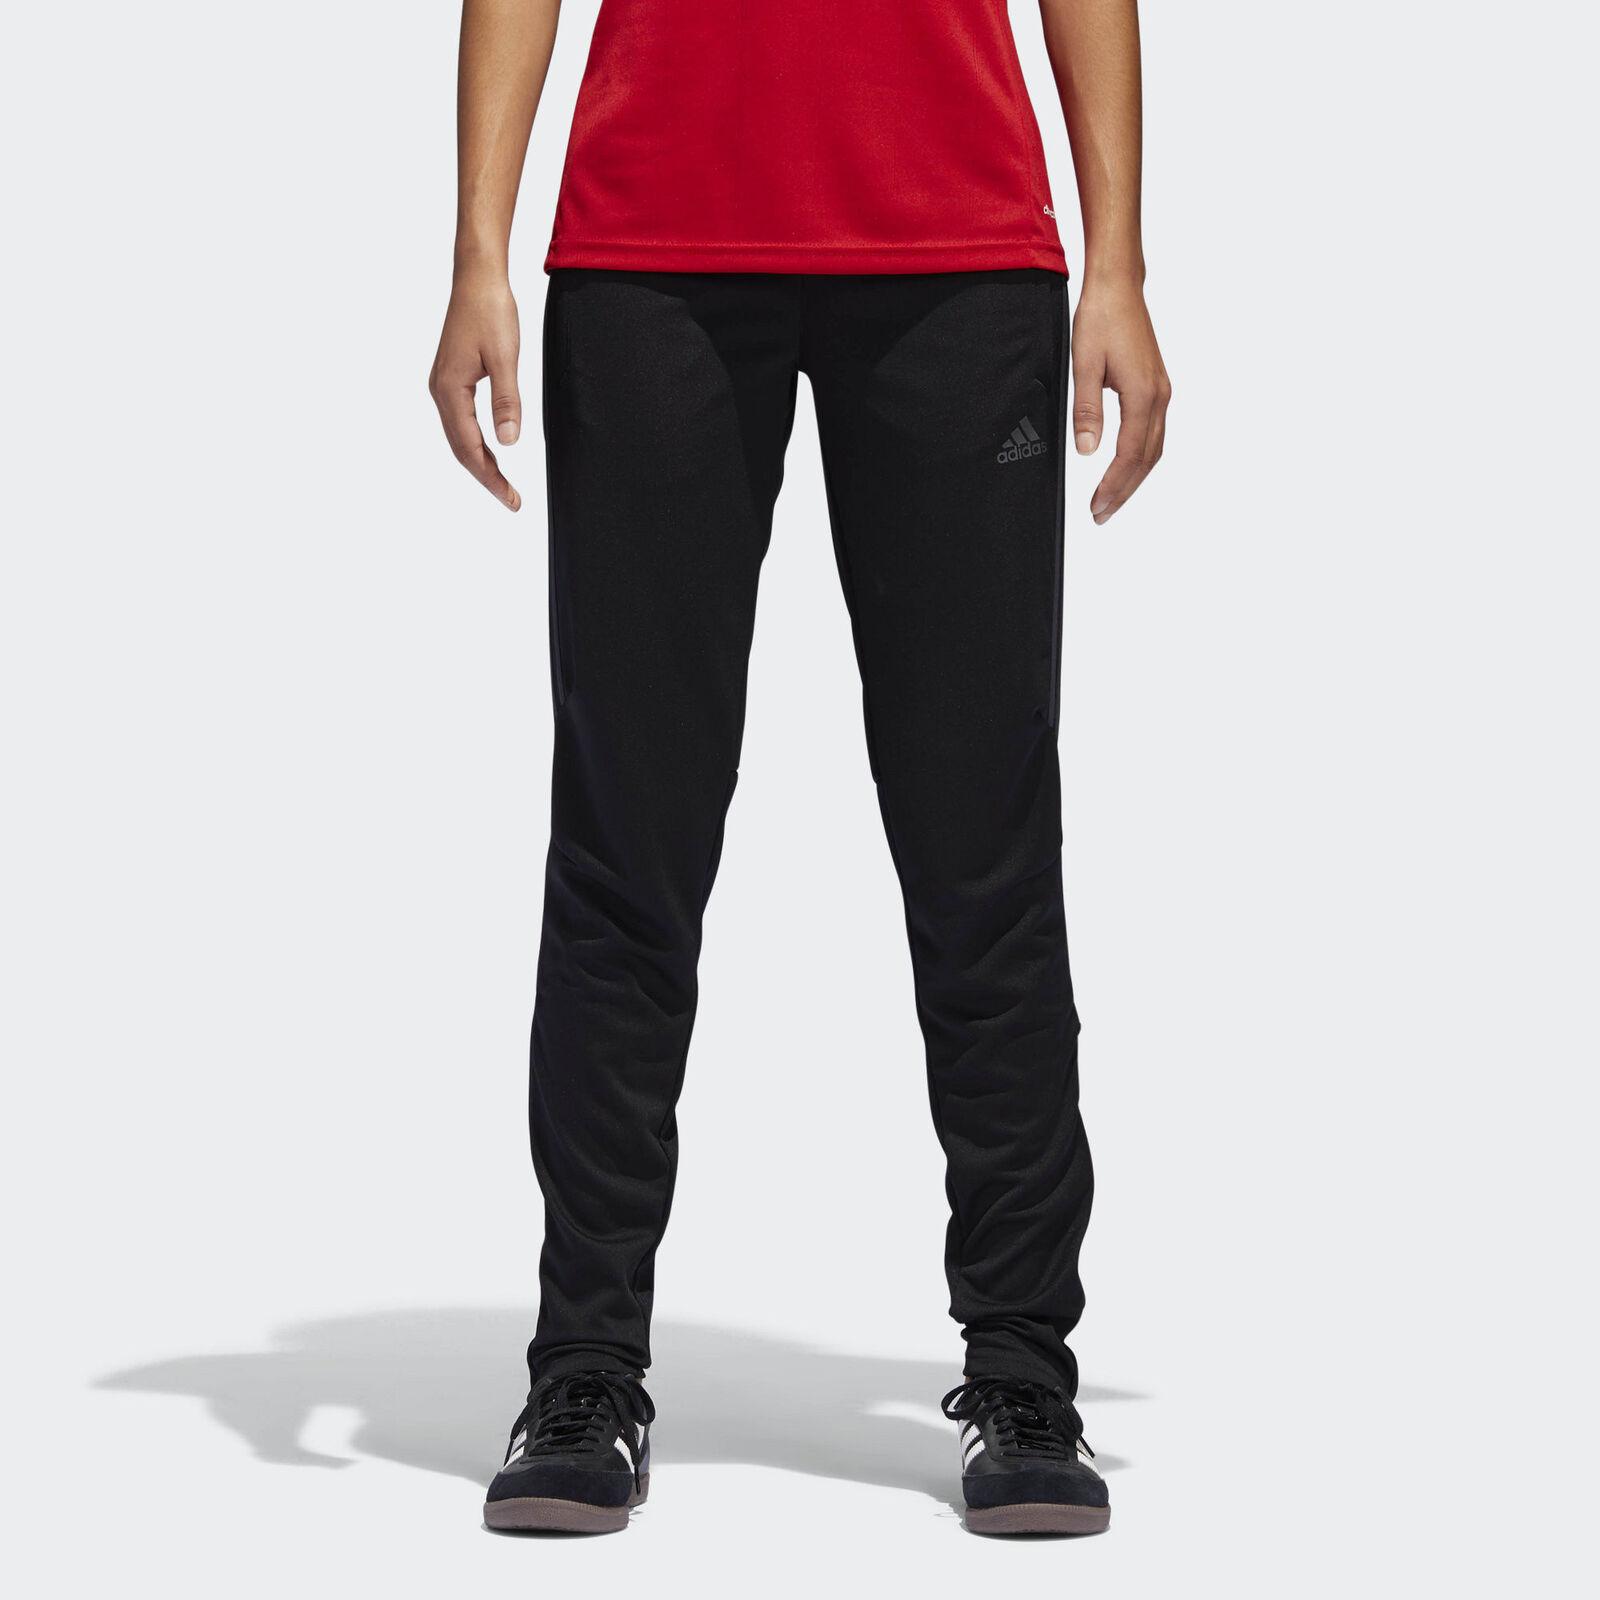 adidas Women's Tiro 17 Training Pants 2 for $34.50 ($17.25 each), adidas Adilette Cloudfoam Plus Logo Slides 2 for $27 ($13.50 each) + free shipping